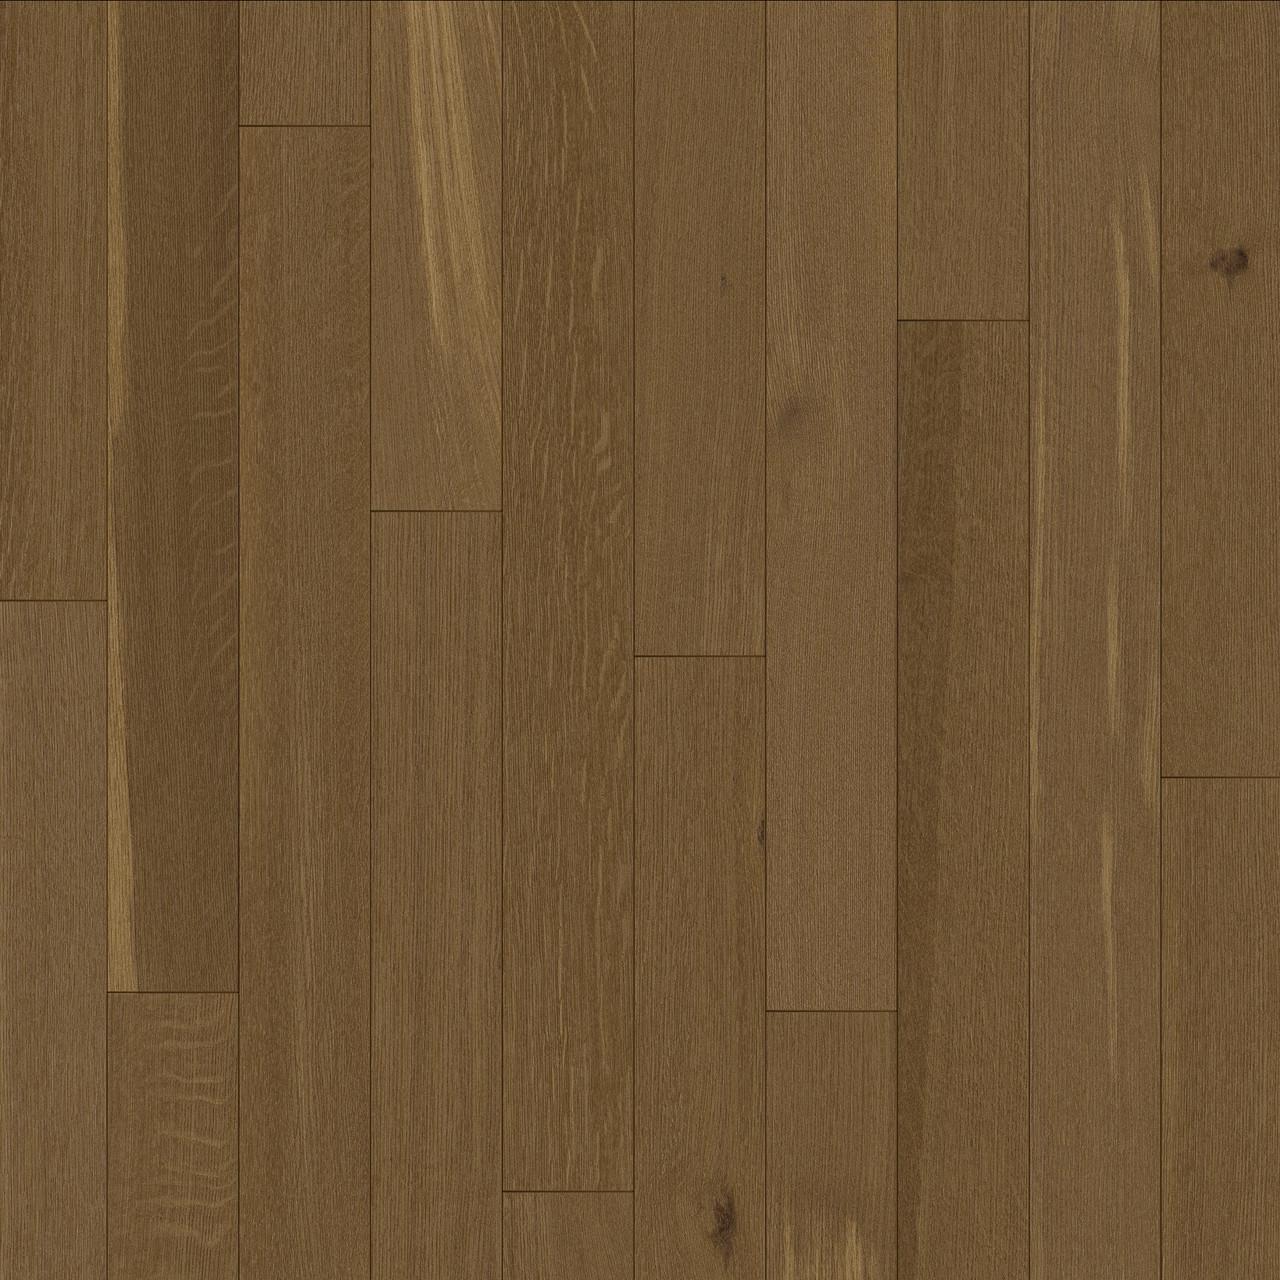 hardwood flooring markham of liquidation hardwood flooring toronto flooring designs regarding hardwood flooring and installation in toronto markham 800 263 6363